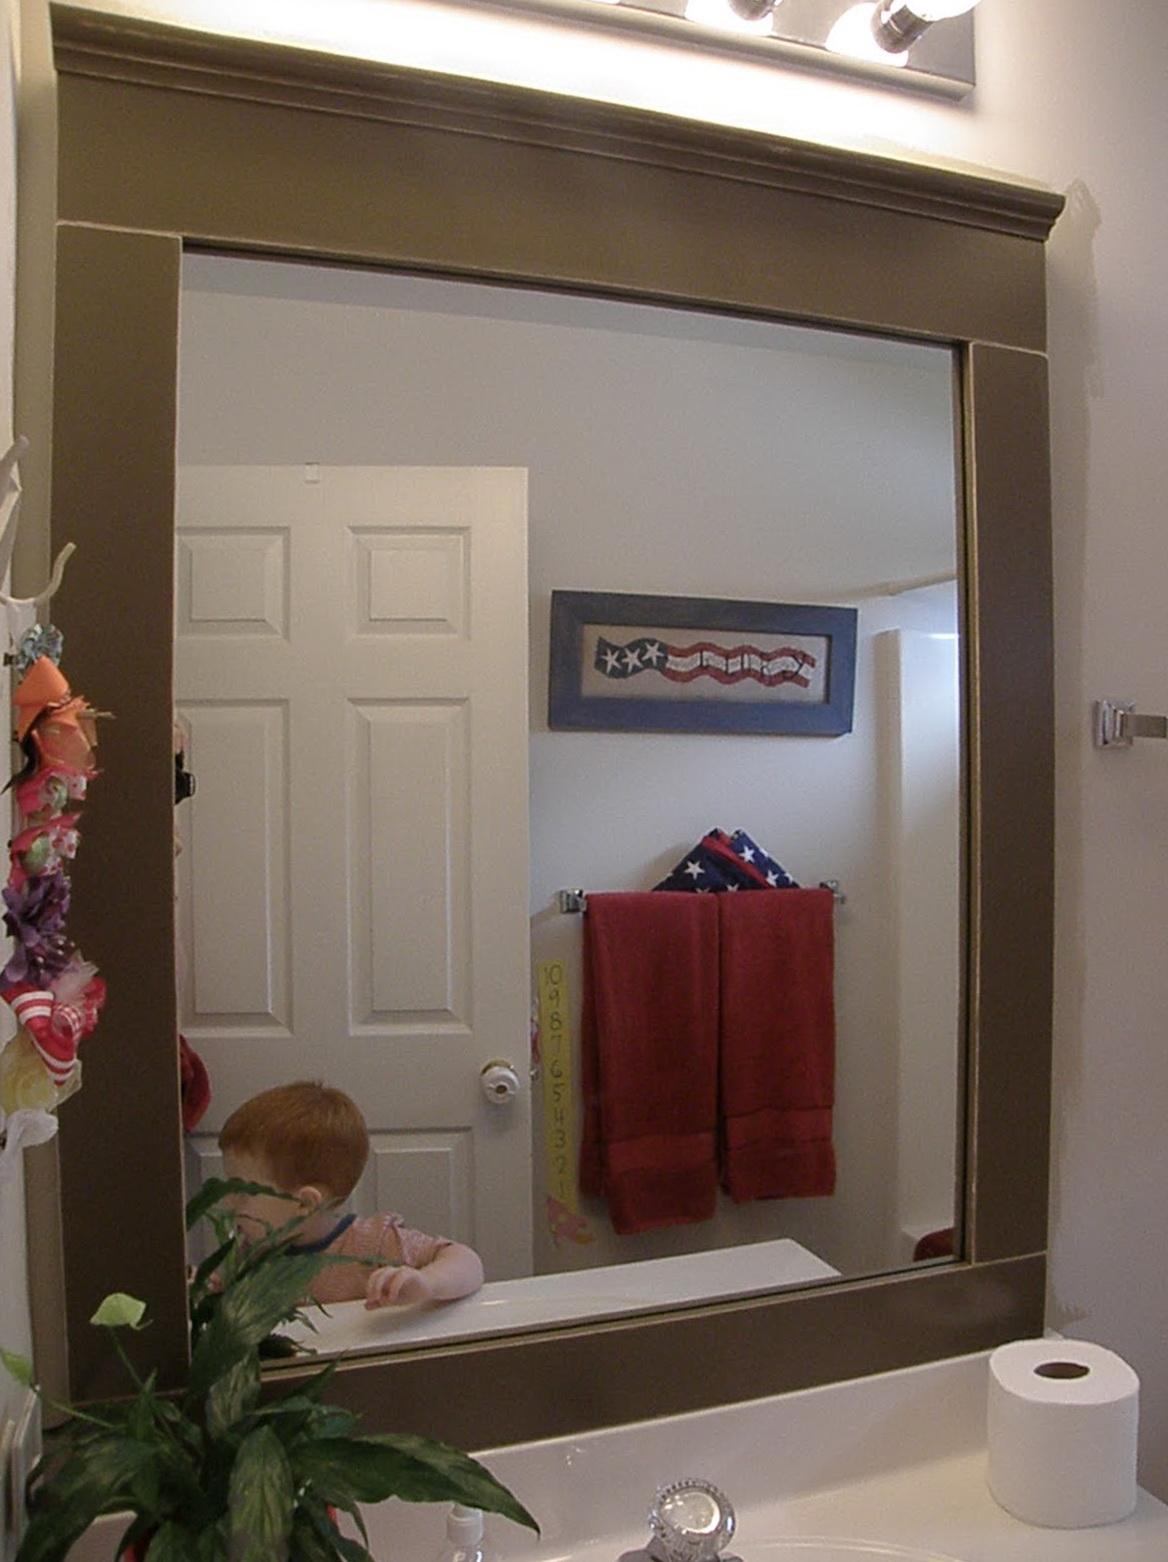 Framed bathroom mirrors ideas home design ideas for Bathroom picture frame ideas